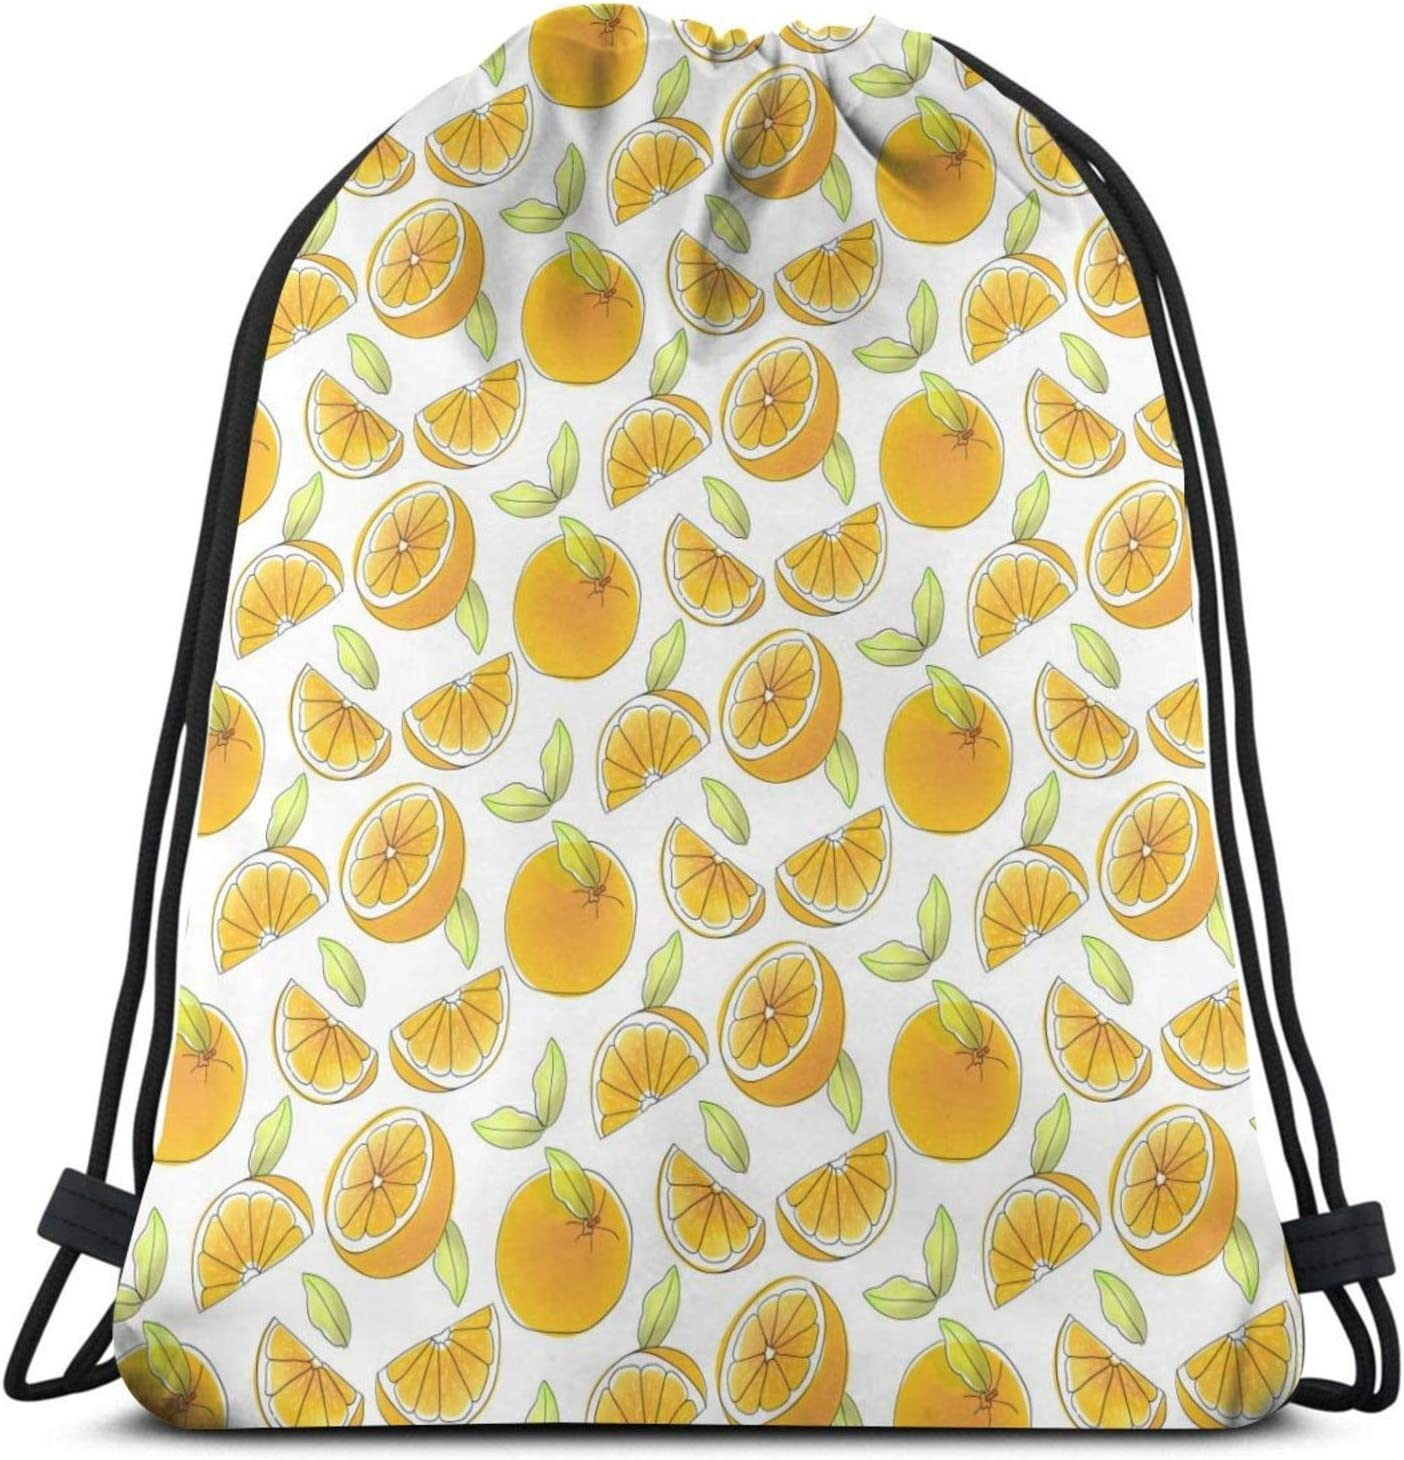 Very Max 79% OFF popular Yellow Oranges Slice Pattern Drawstring Travel Hiki Bag Backpack